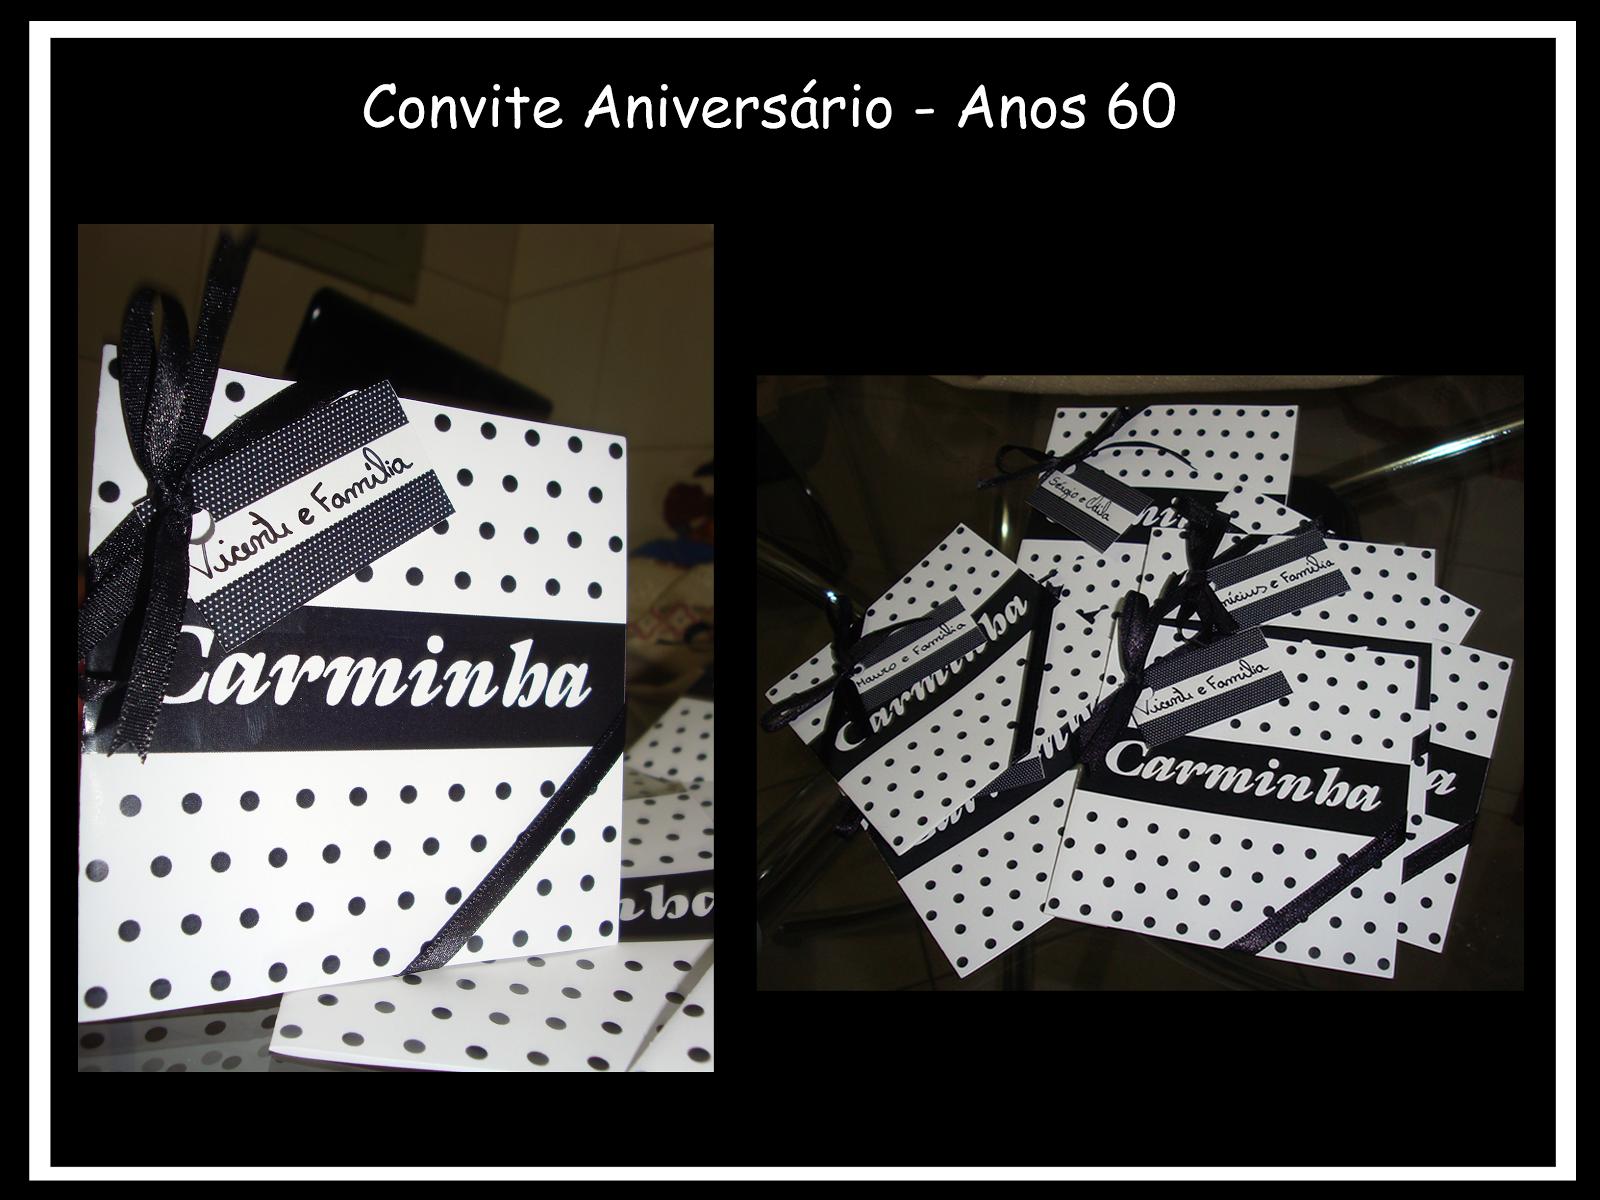 Convite de Aniversario 50 Anos Feminino Convite Aniversário Anos 60